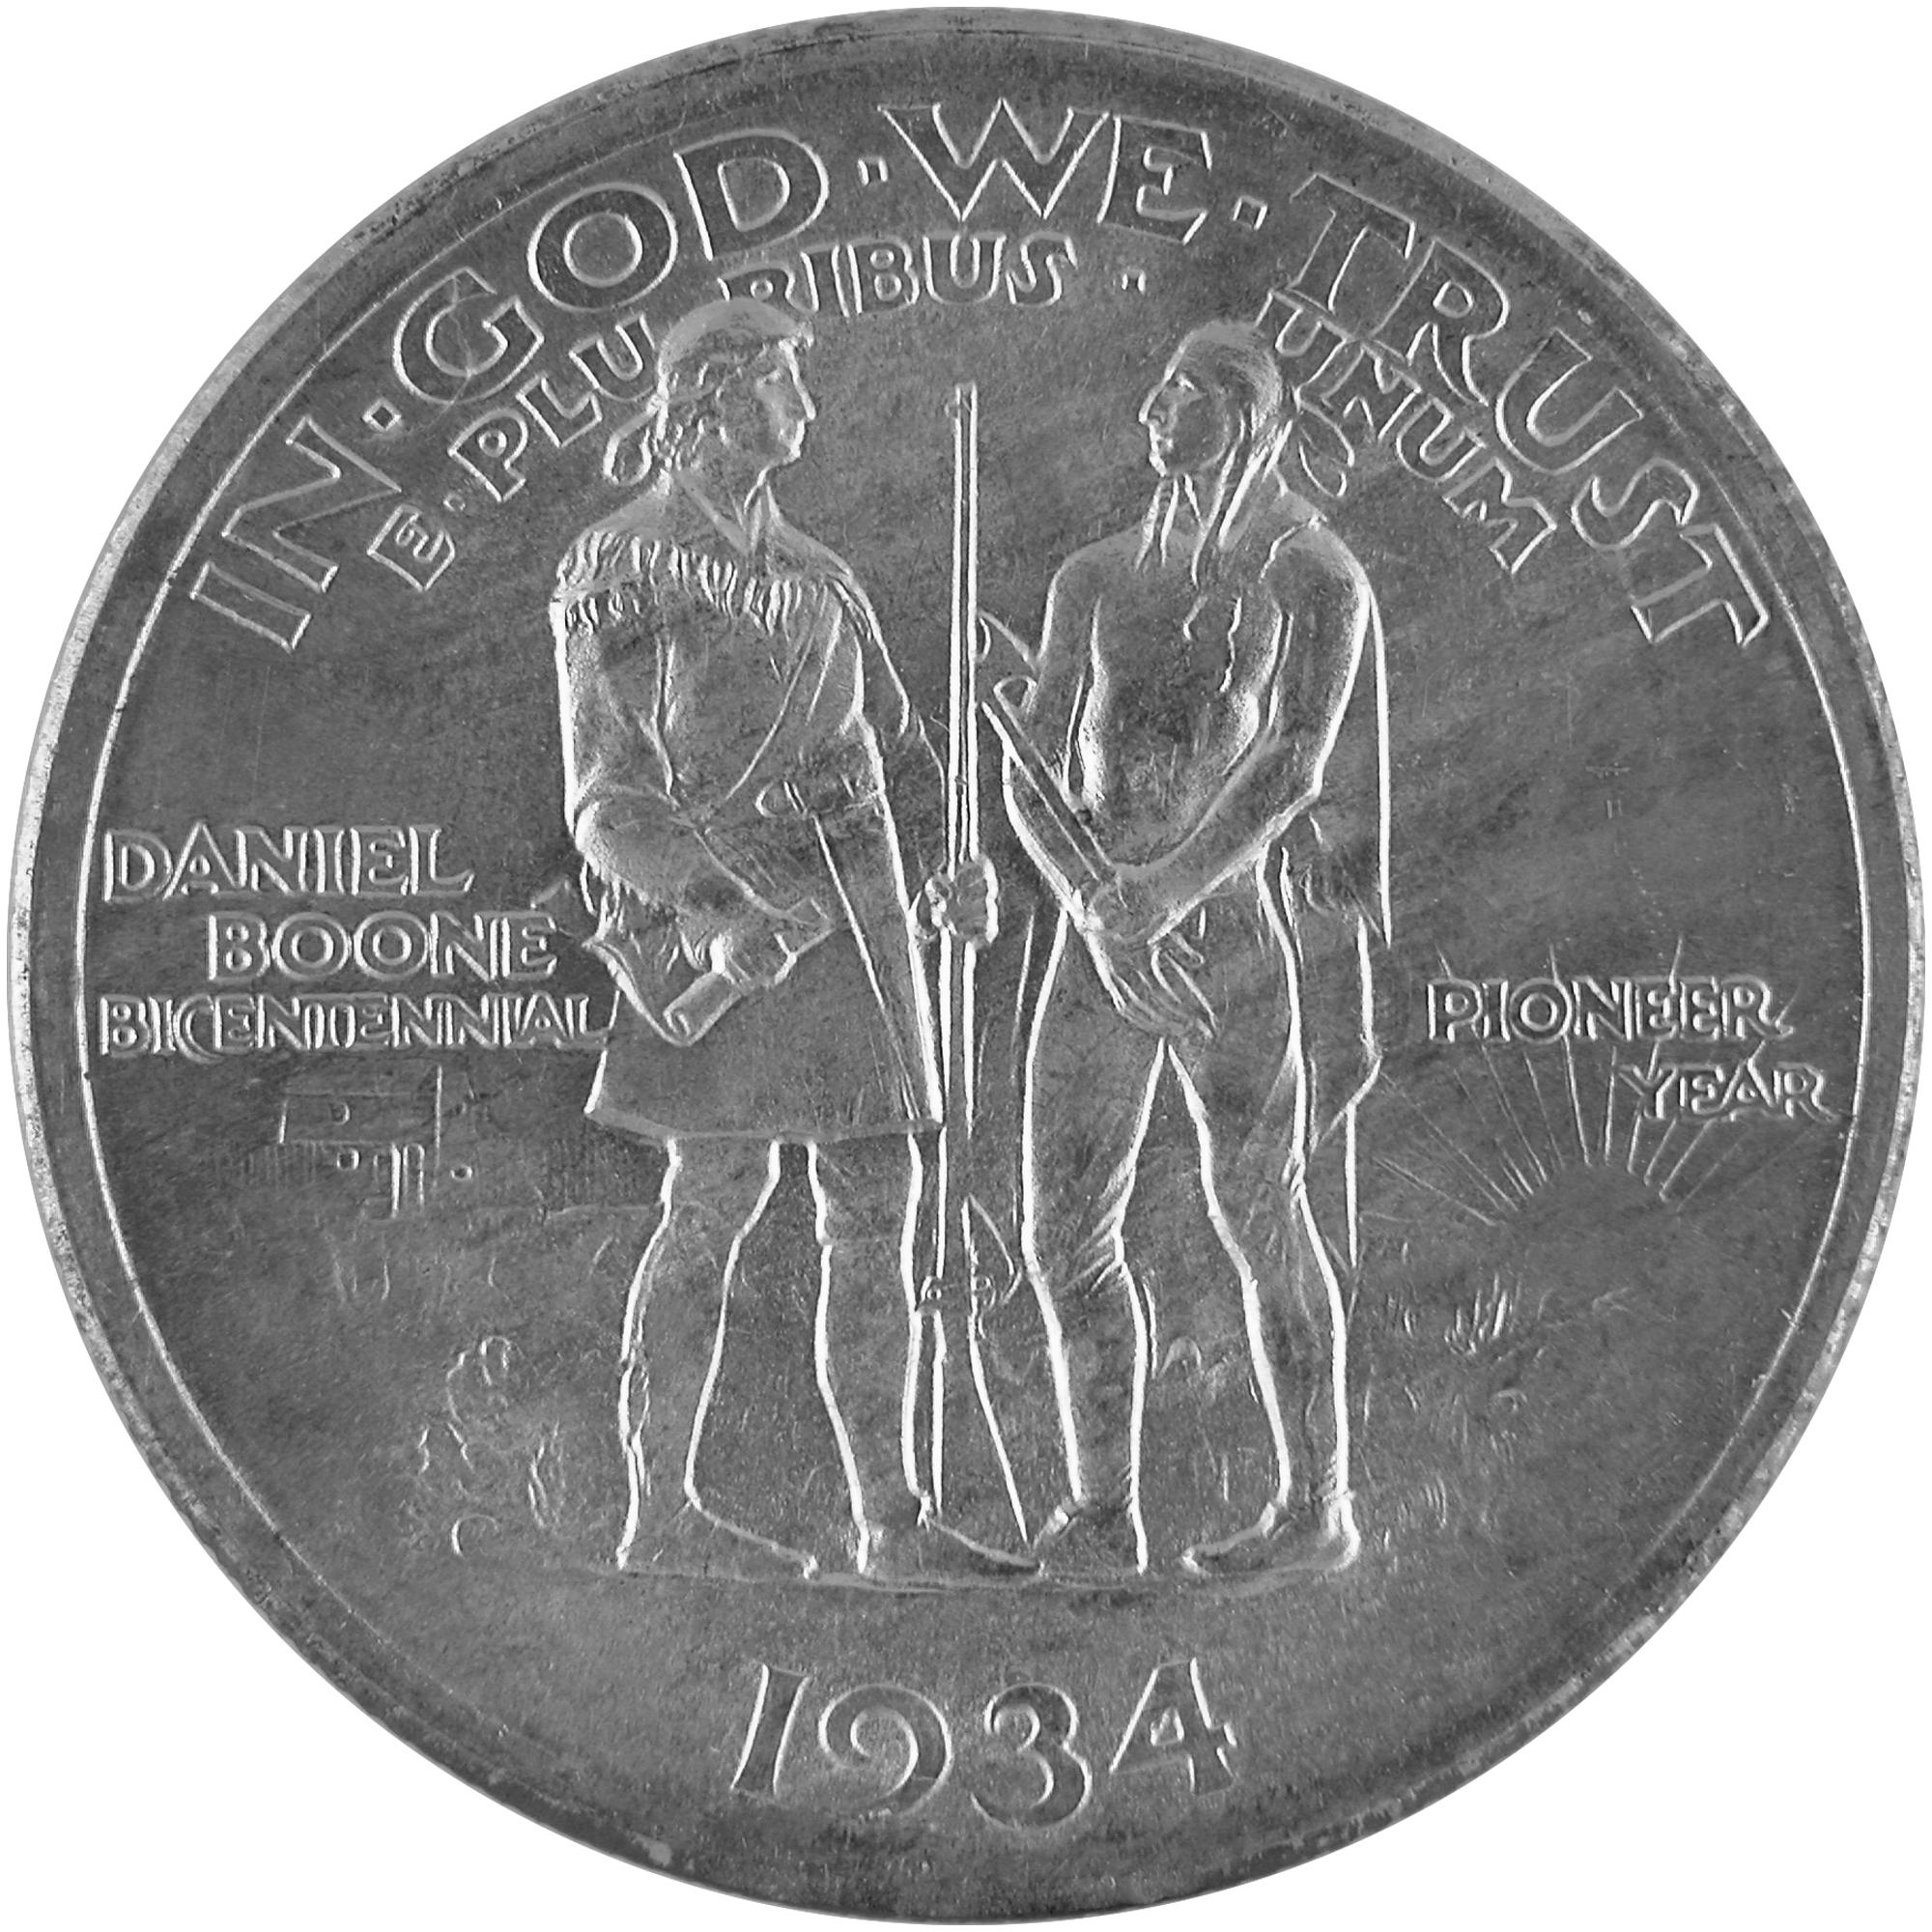 1934 Daniel Boone Bicentennial Commemorative Silver Half Dollar Coin Reverse